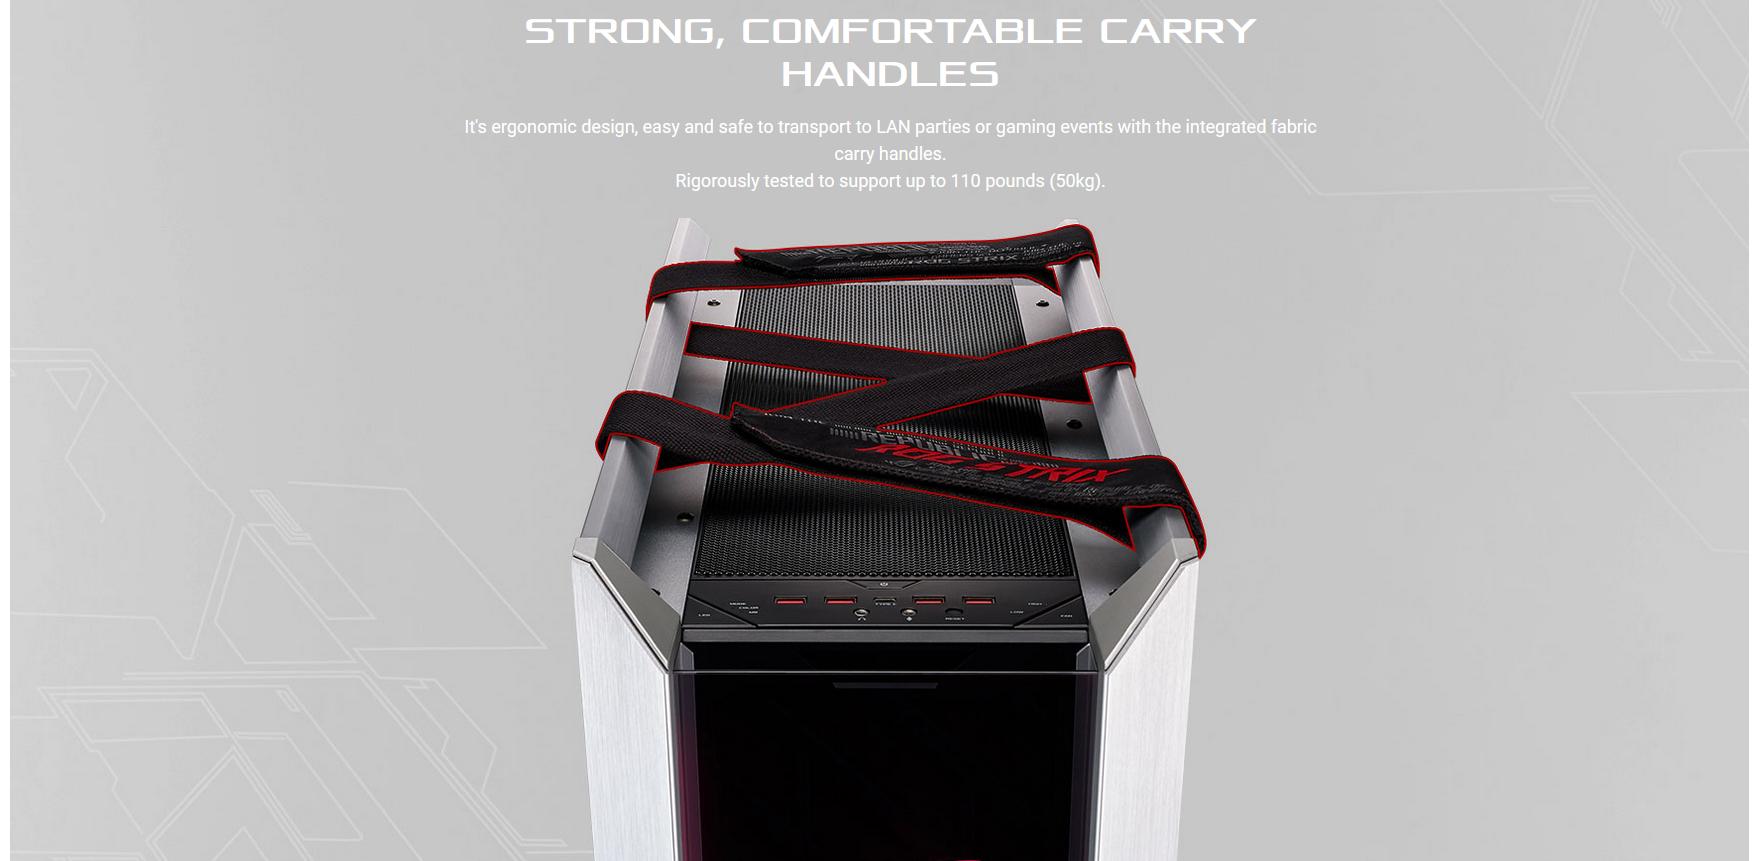 ASUS ROG Strix Helios GX601 White Edition (Mid Tower/Màu Trắng) giới thiệu 7